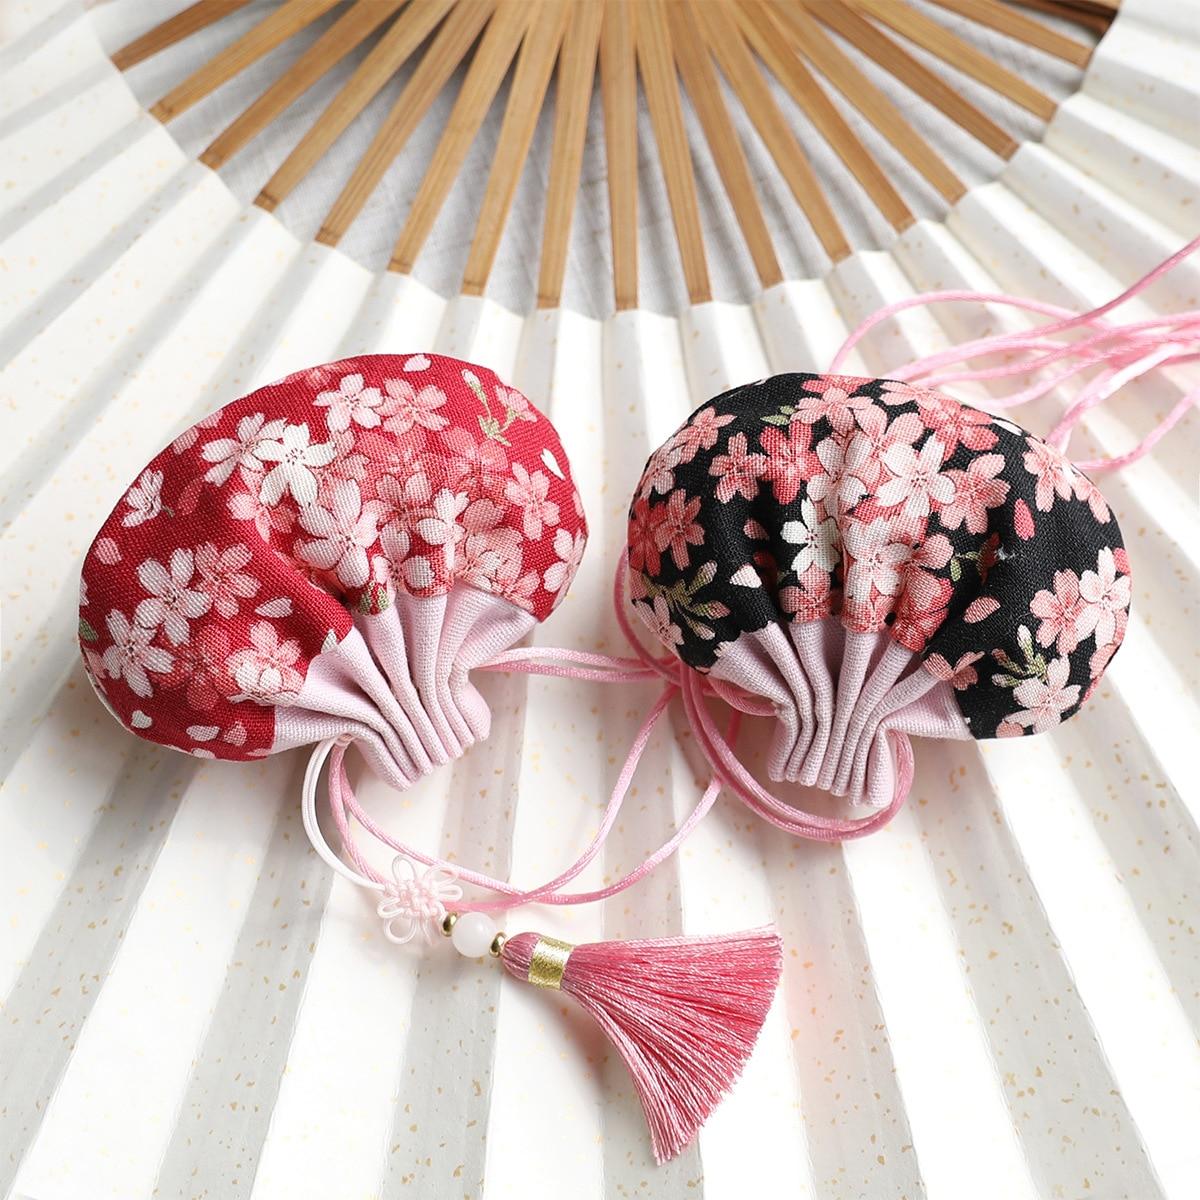 Cotton High Quality Japanese Cherry Blossom Splice Retro Series Palace Sachet Bag Tassel Jewelry Bags Car Decoration Gift Bag